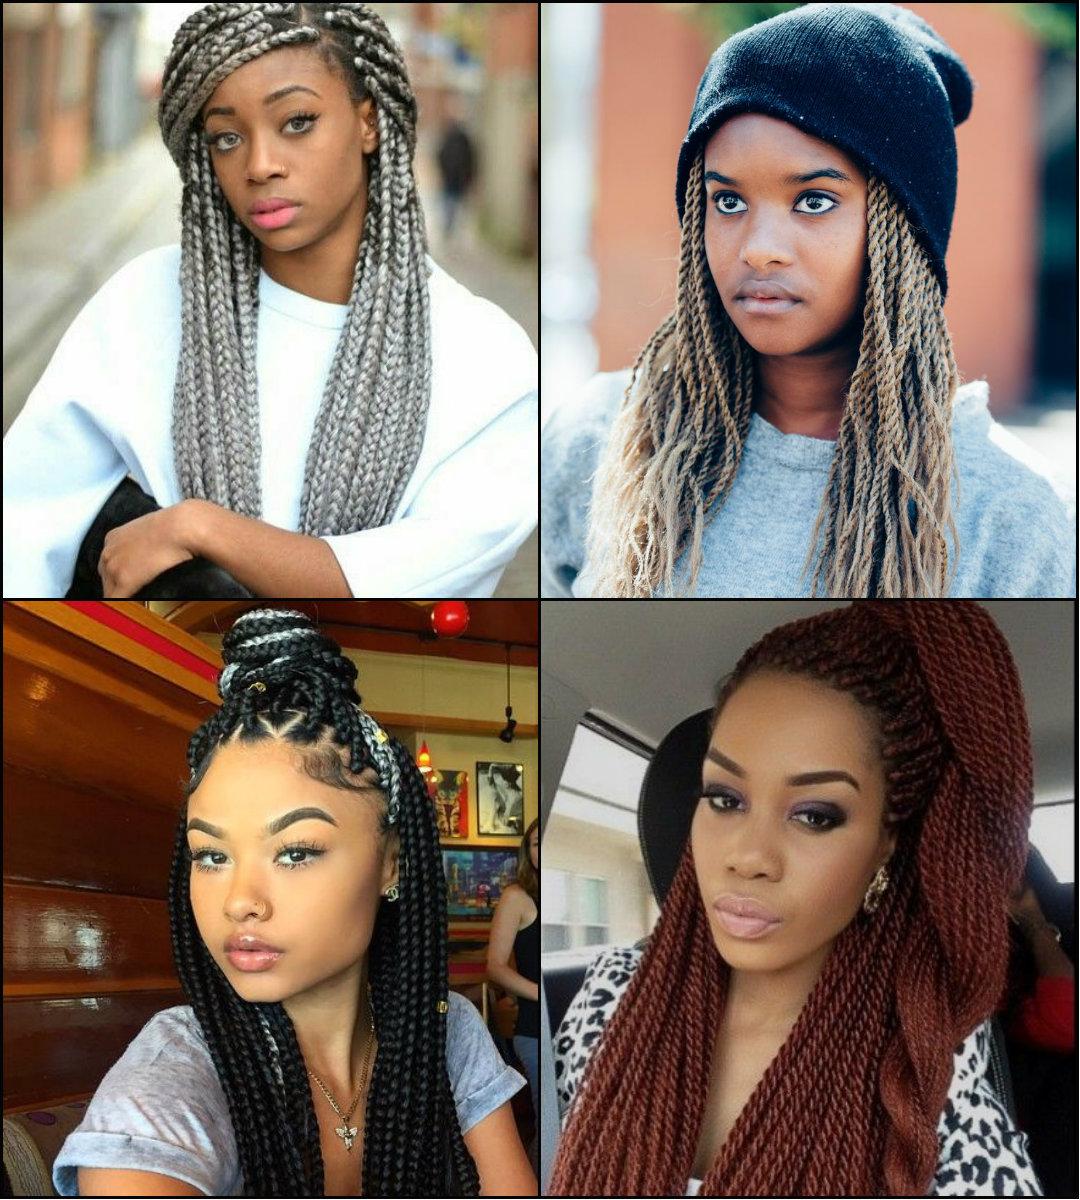 Sensational Twists And Braids Black Hairstyles 2017 Hairstyles 2016 Hair Hairstyle Inspiration Daily Dogsangcom